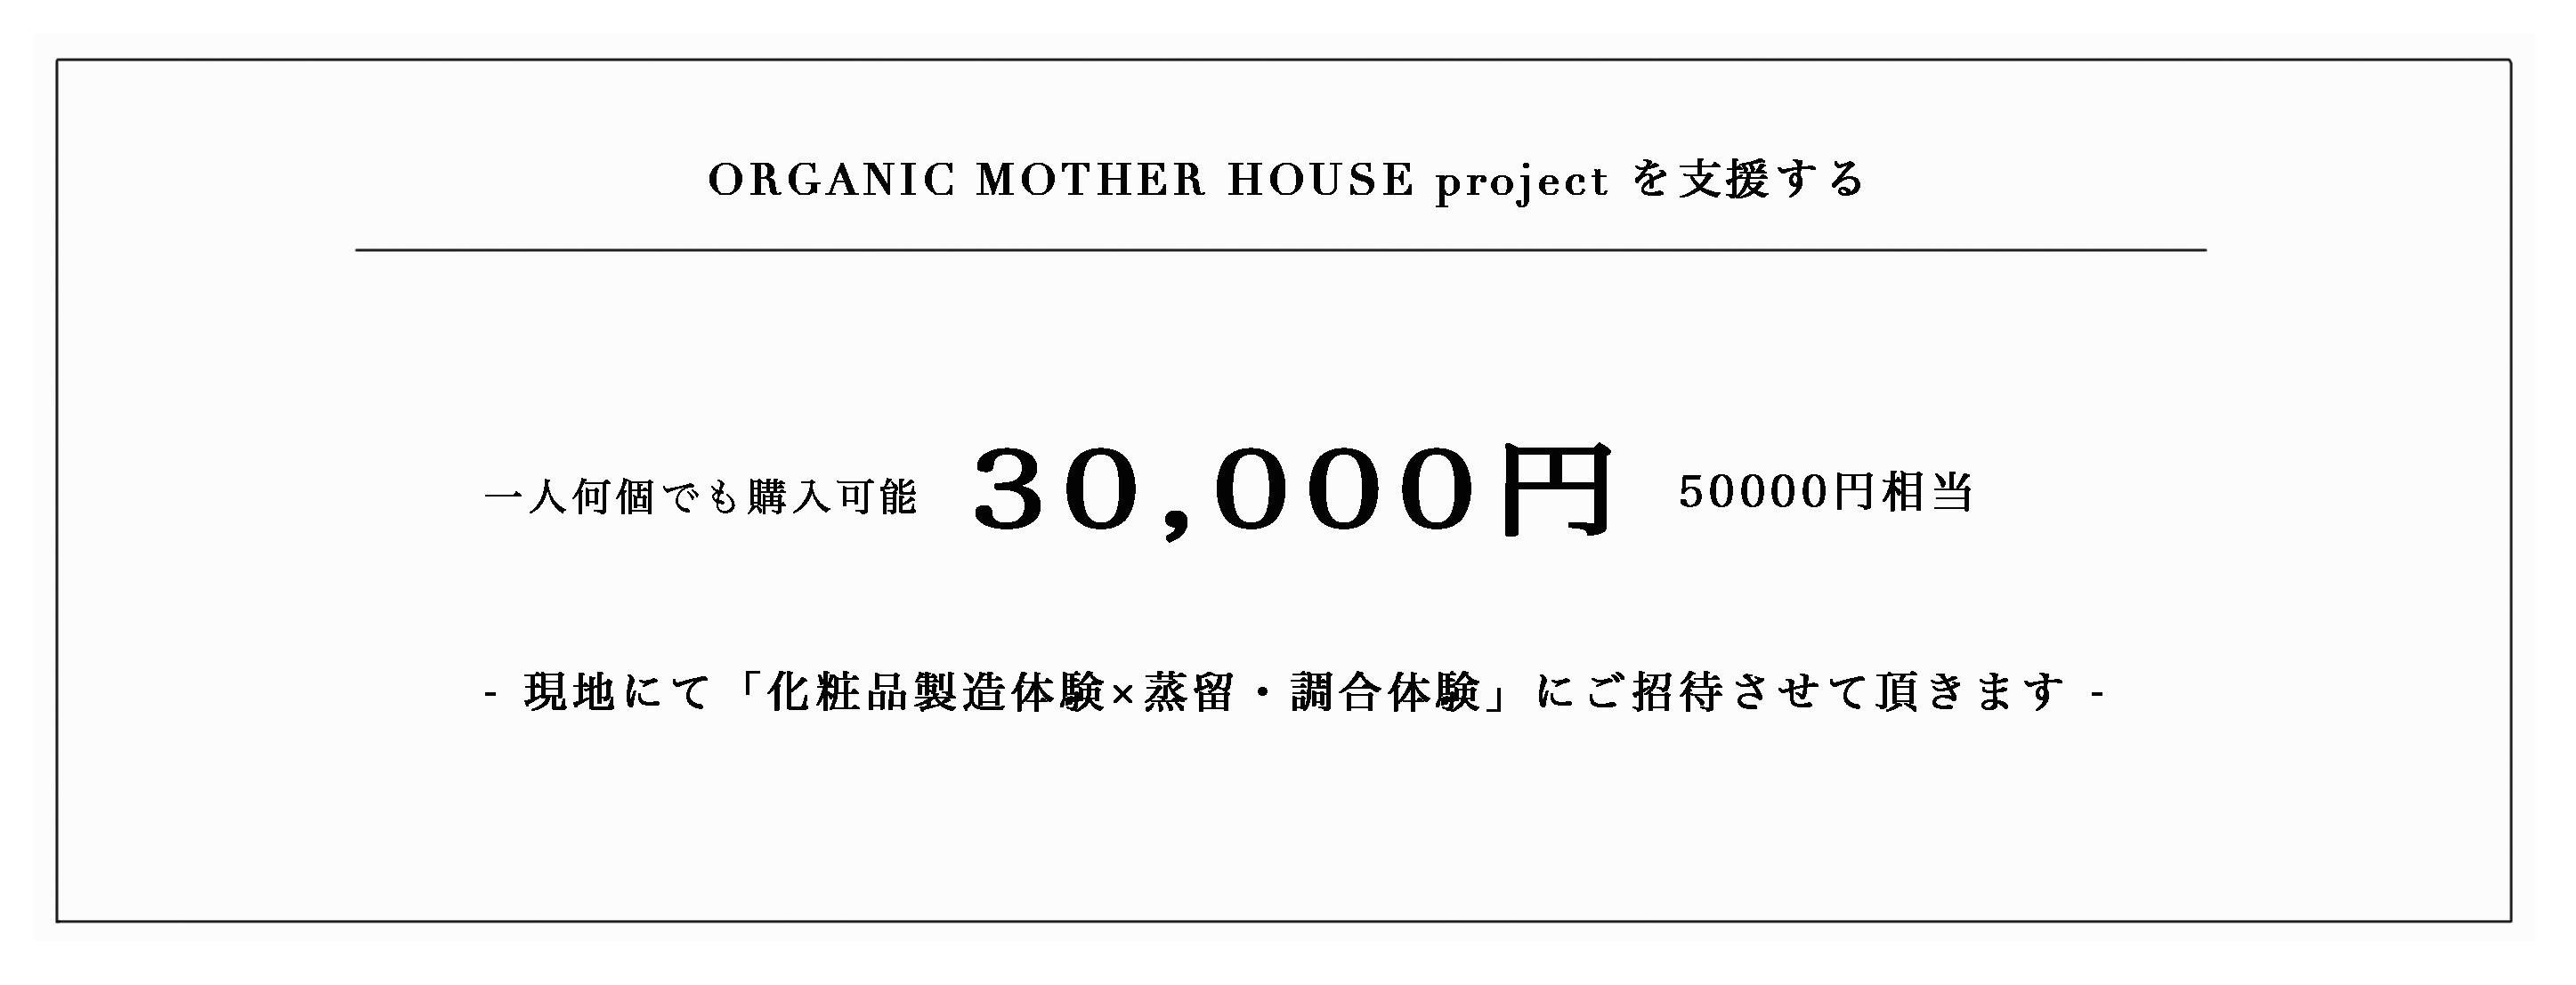 ORGANIC MOTHER HOUSE〈植物調合美容研究所〉3万3